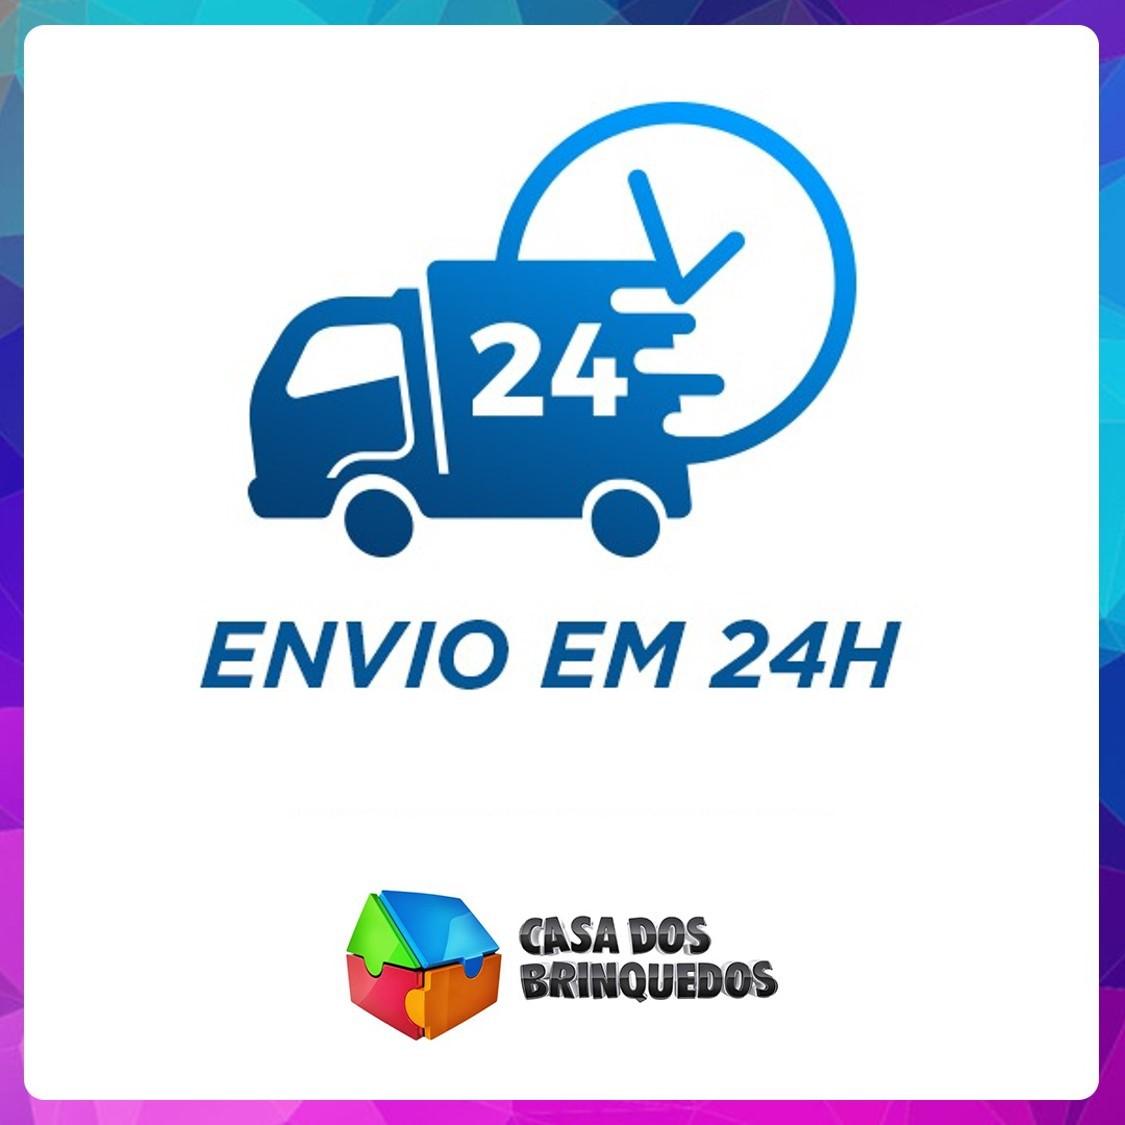 CONJUNTO AEROPORTO GRANDE 77888 FÊNIX